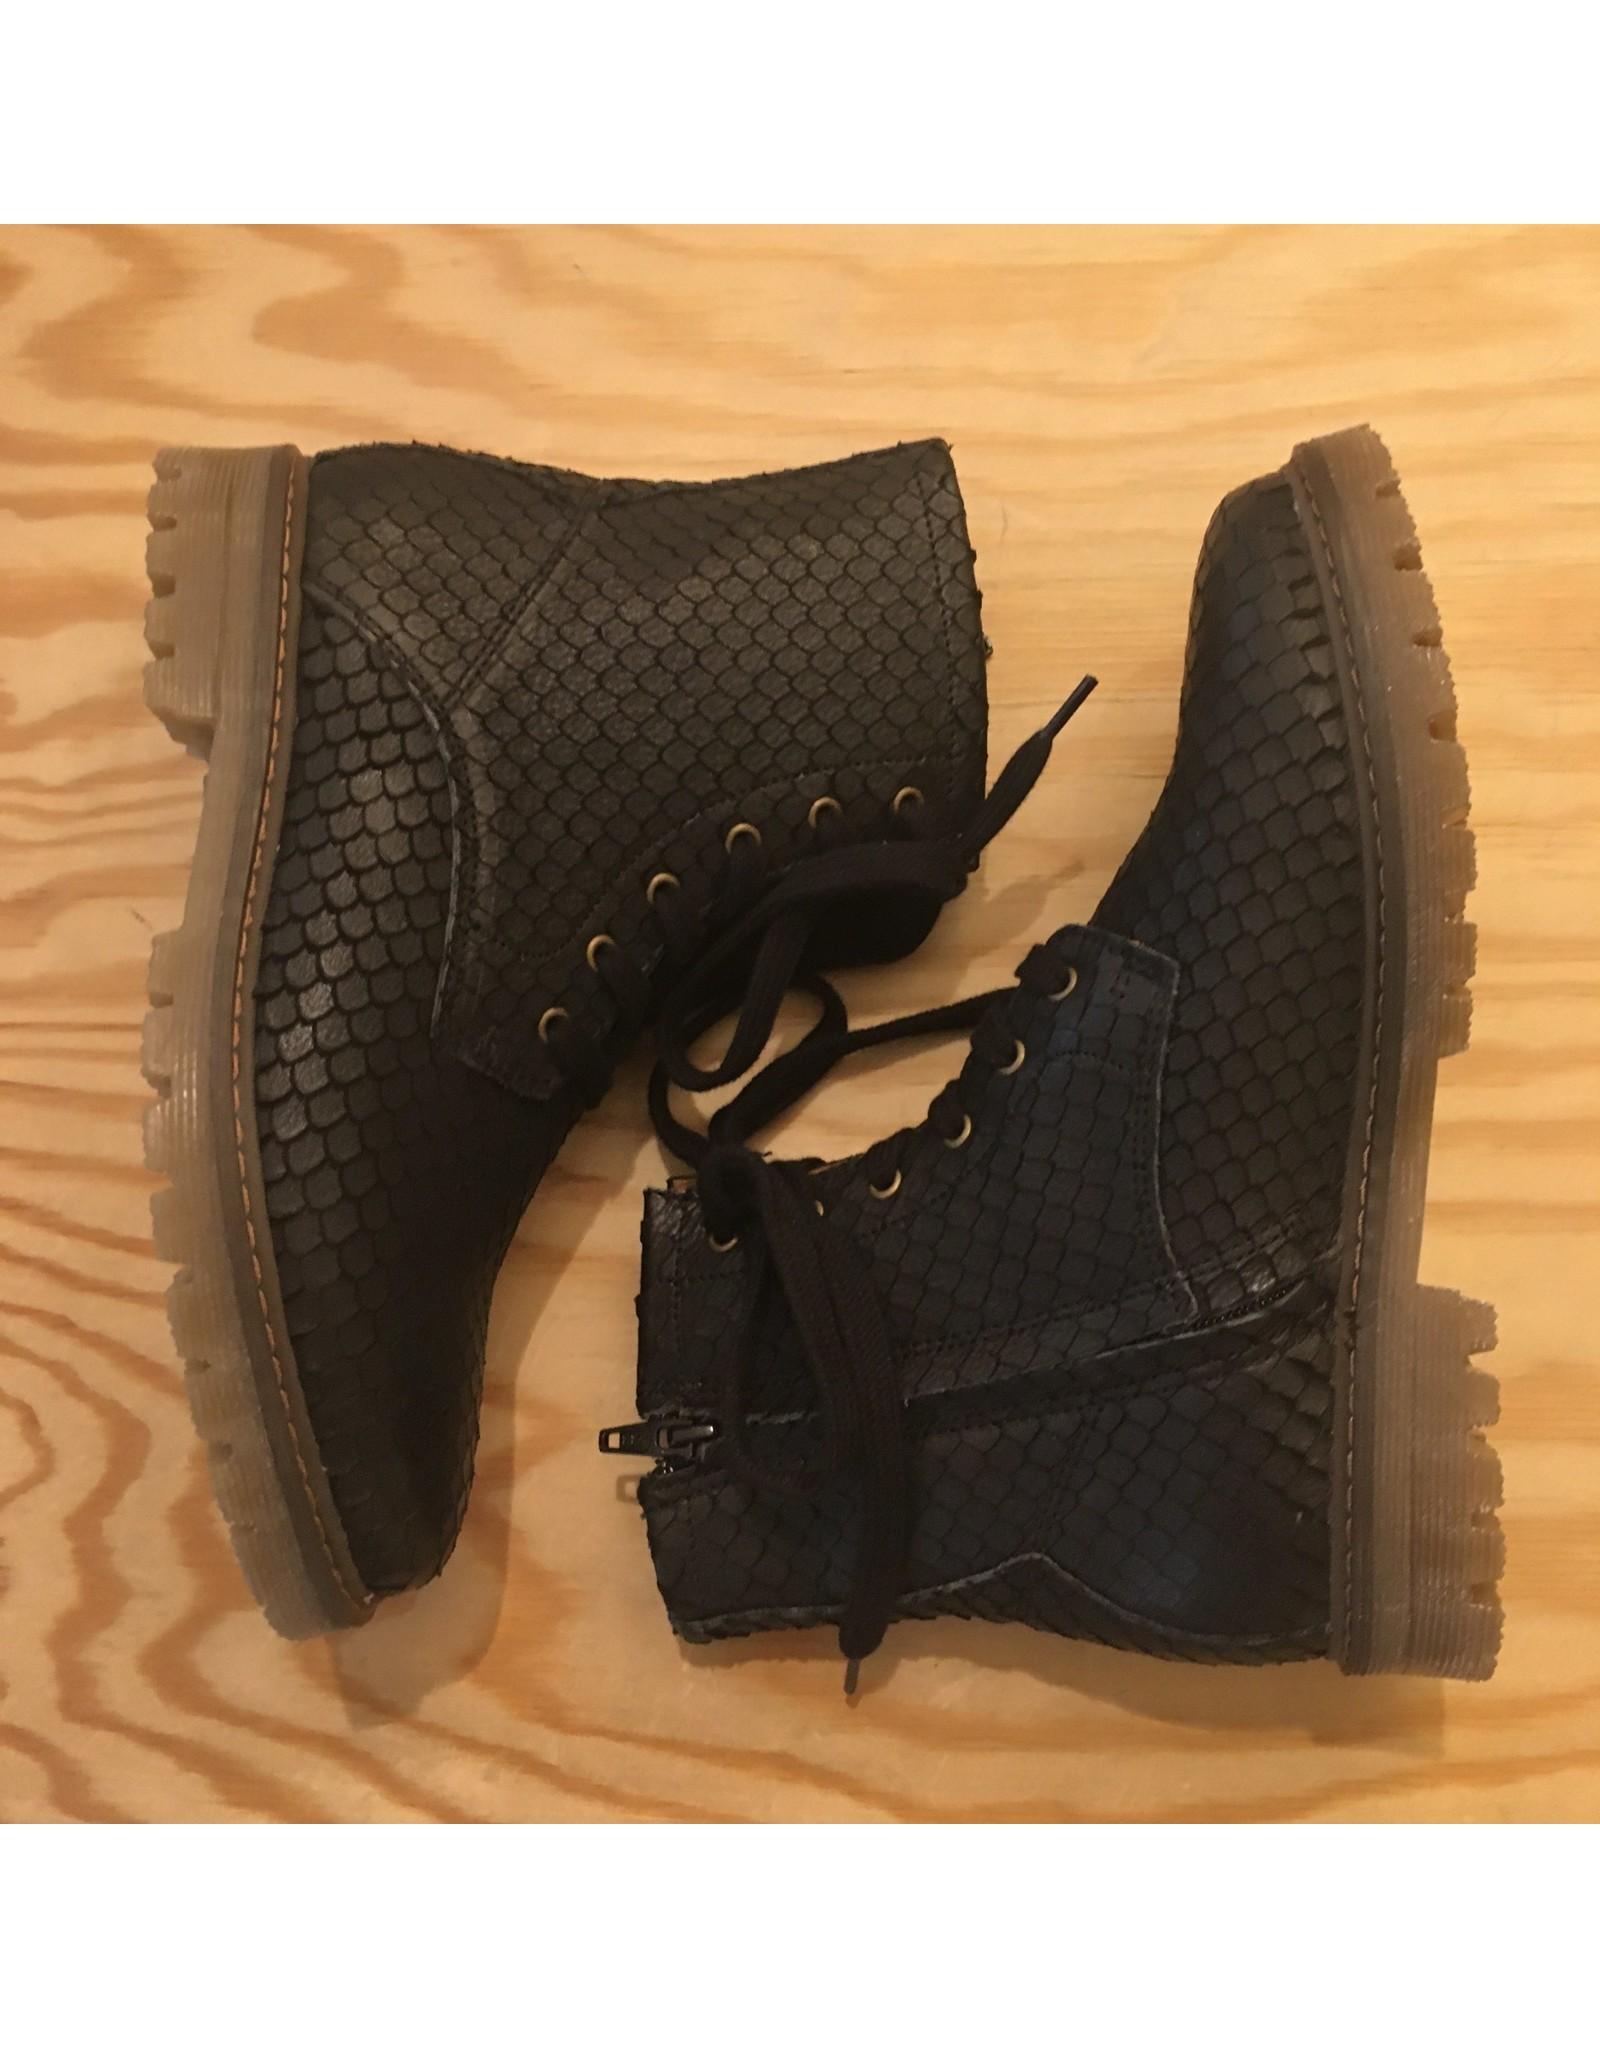 BISGAARD BISGAARD 51905.218 BOOTS BLACK SCALE